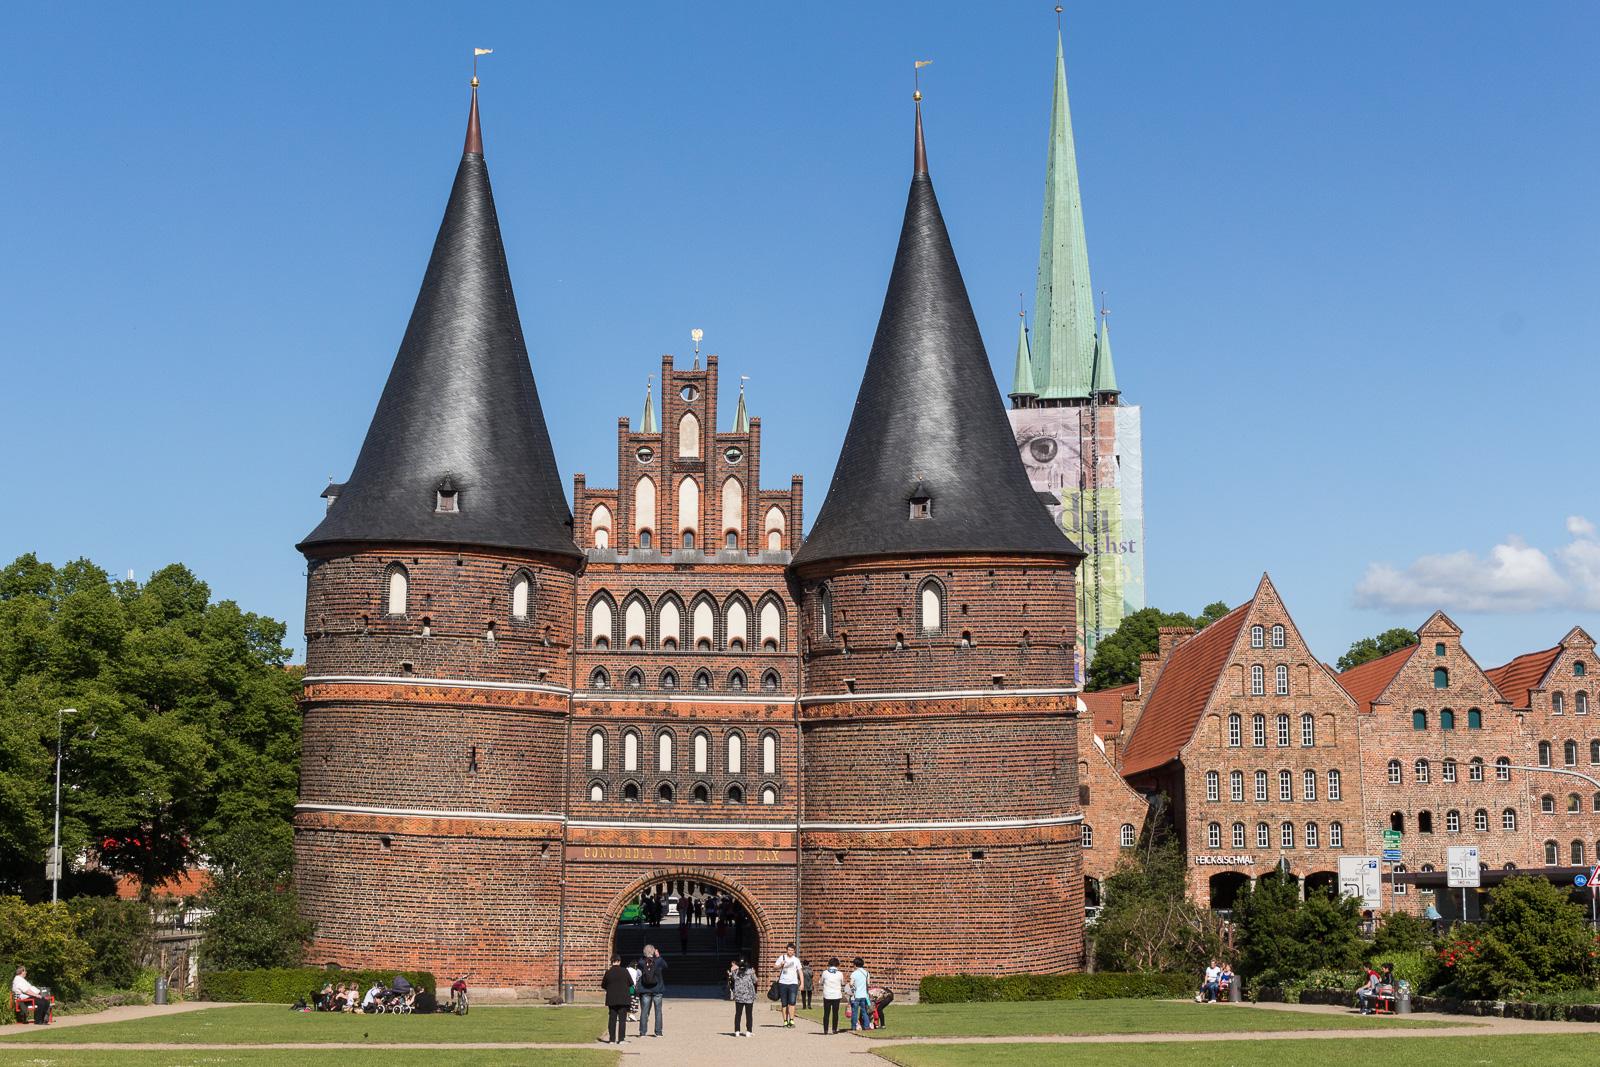 Lübeck, Luebeck, Lübecker Altstadt, Sightseeing, Städtetour, Luebeck entdecken, Unesco Weltkuturerbe, Sightseeing, Marzipan, holstentor,